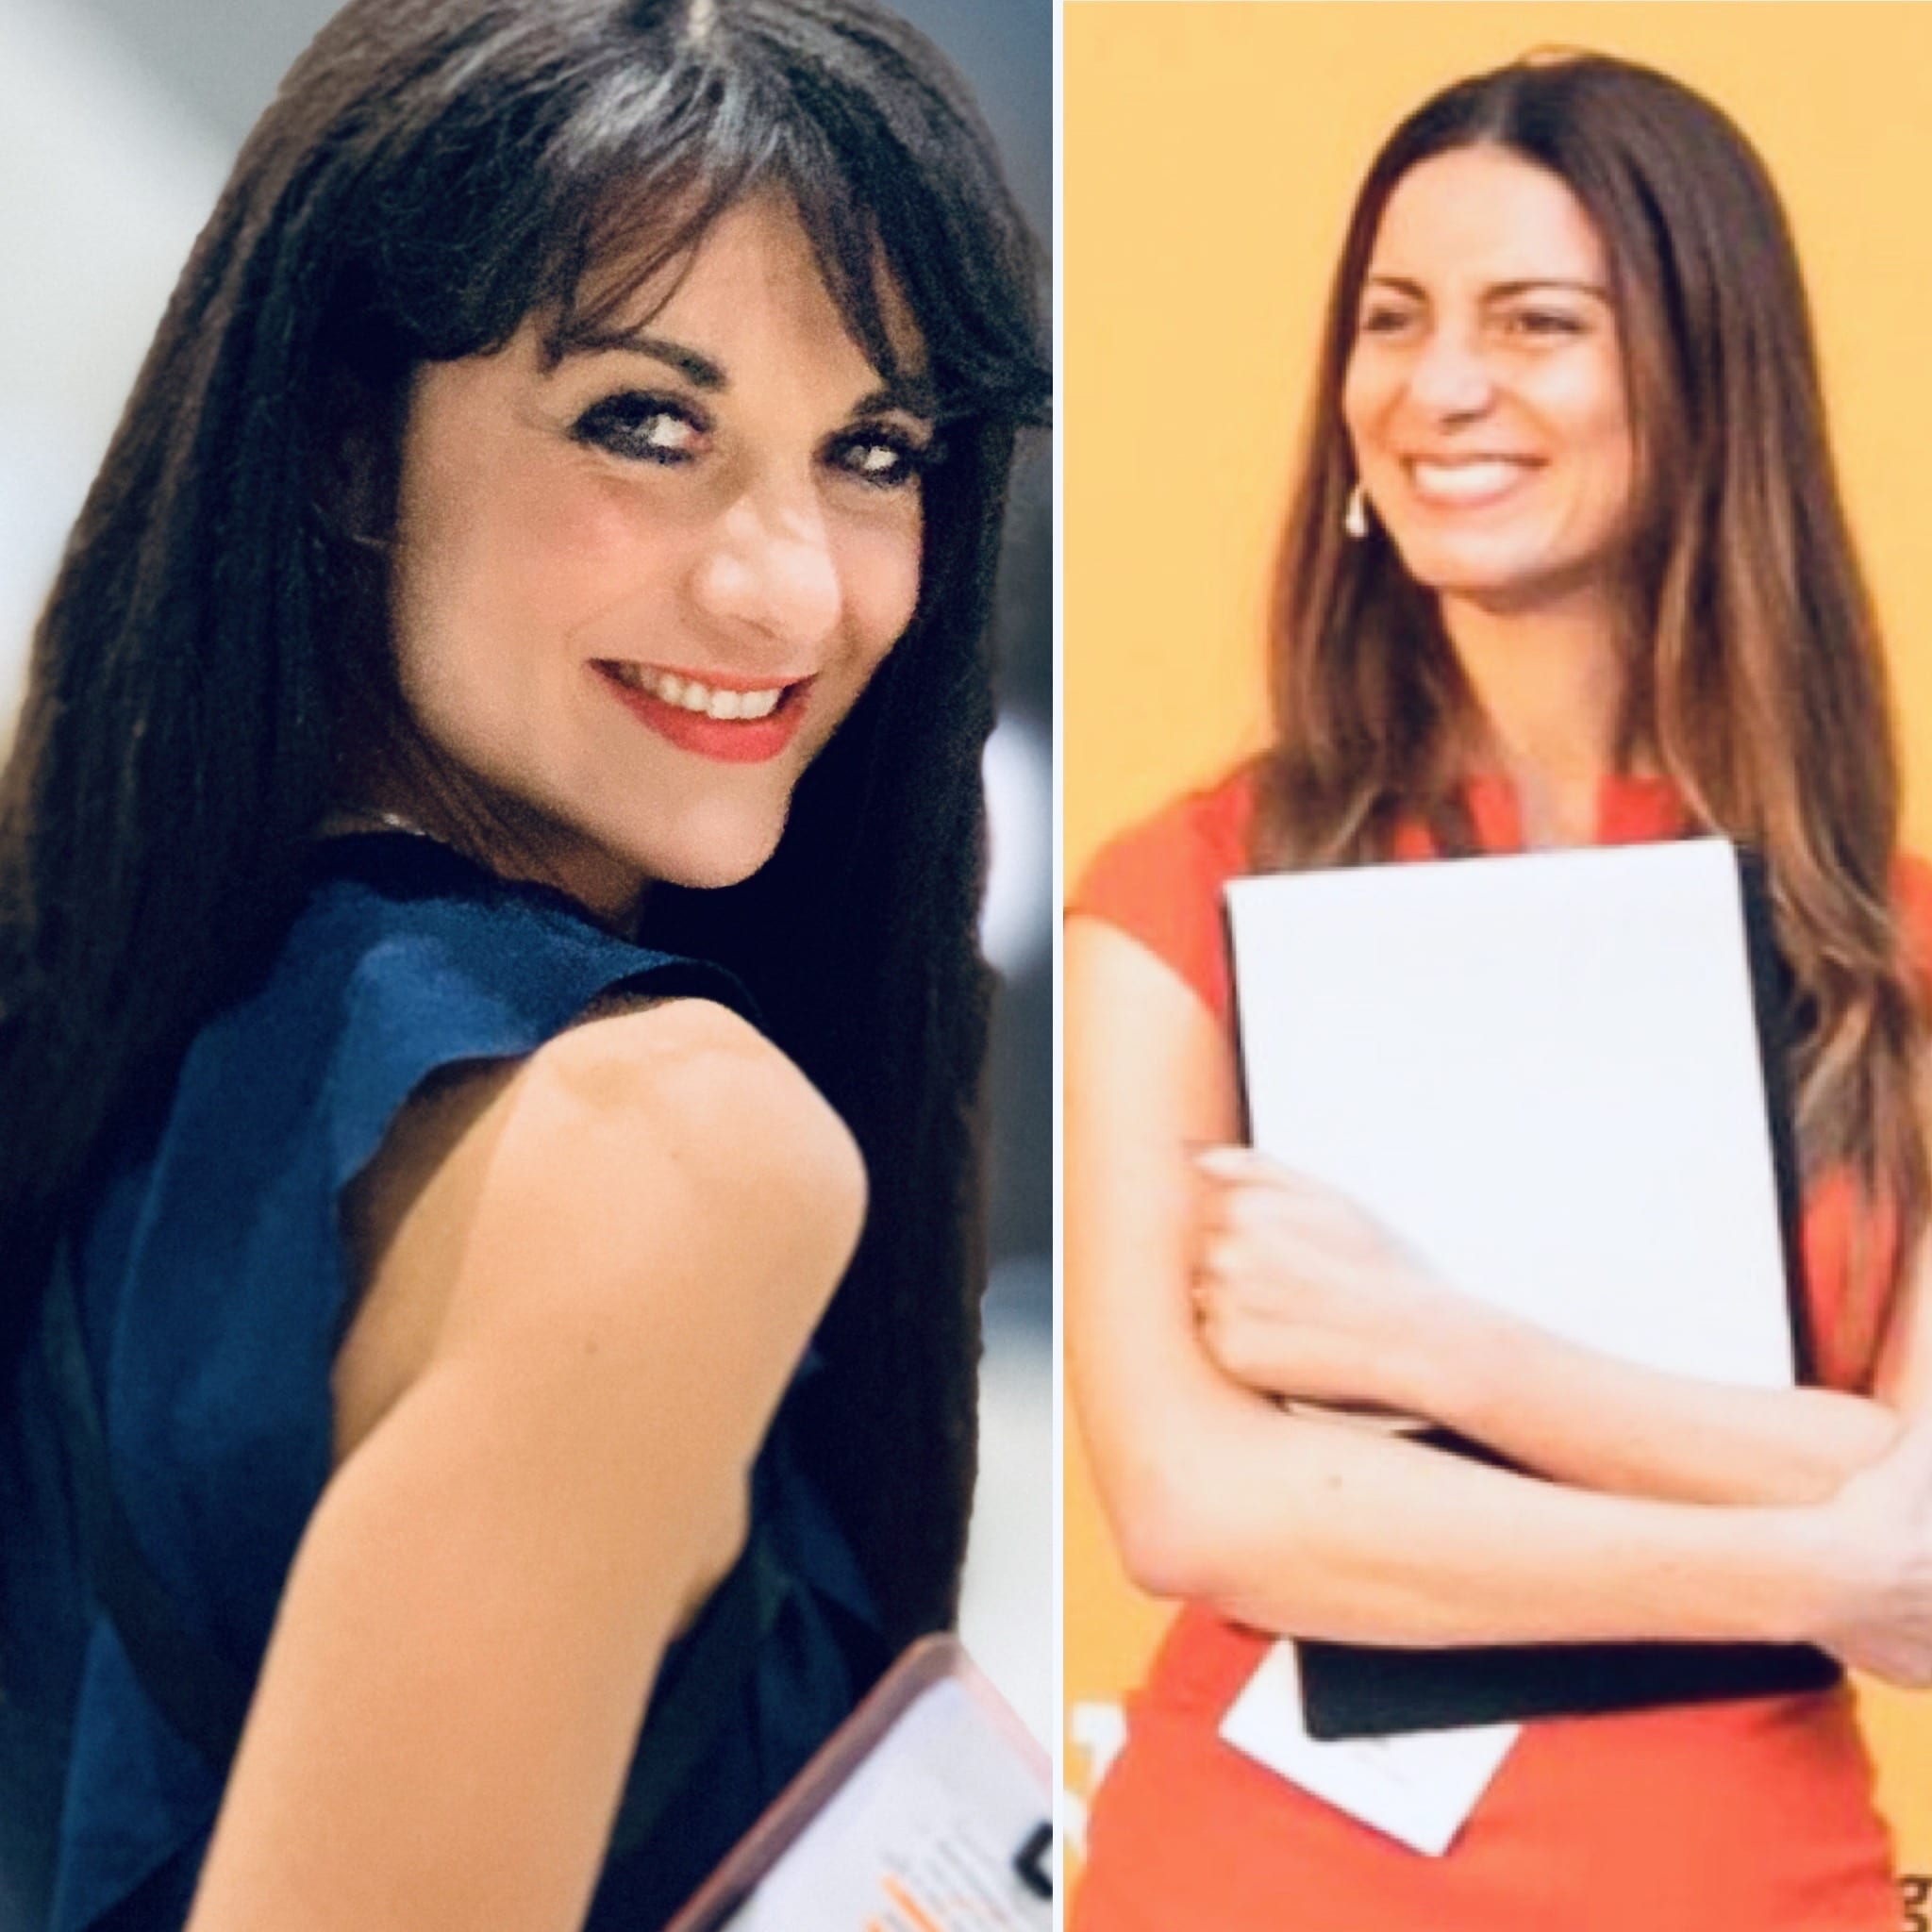 Sara De Bellis direttrice di MangiaeBevi e Chiara Giannotti di Vino.tv.